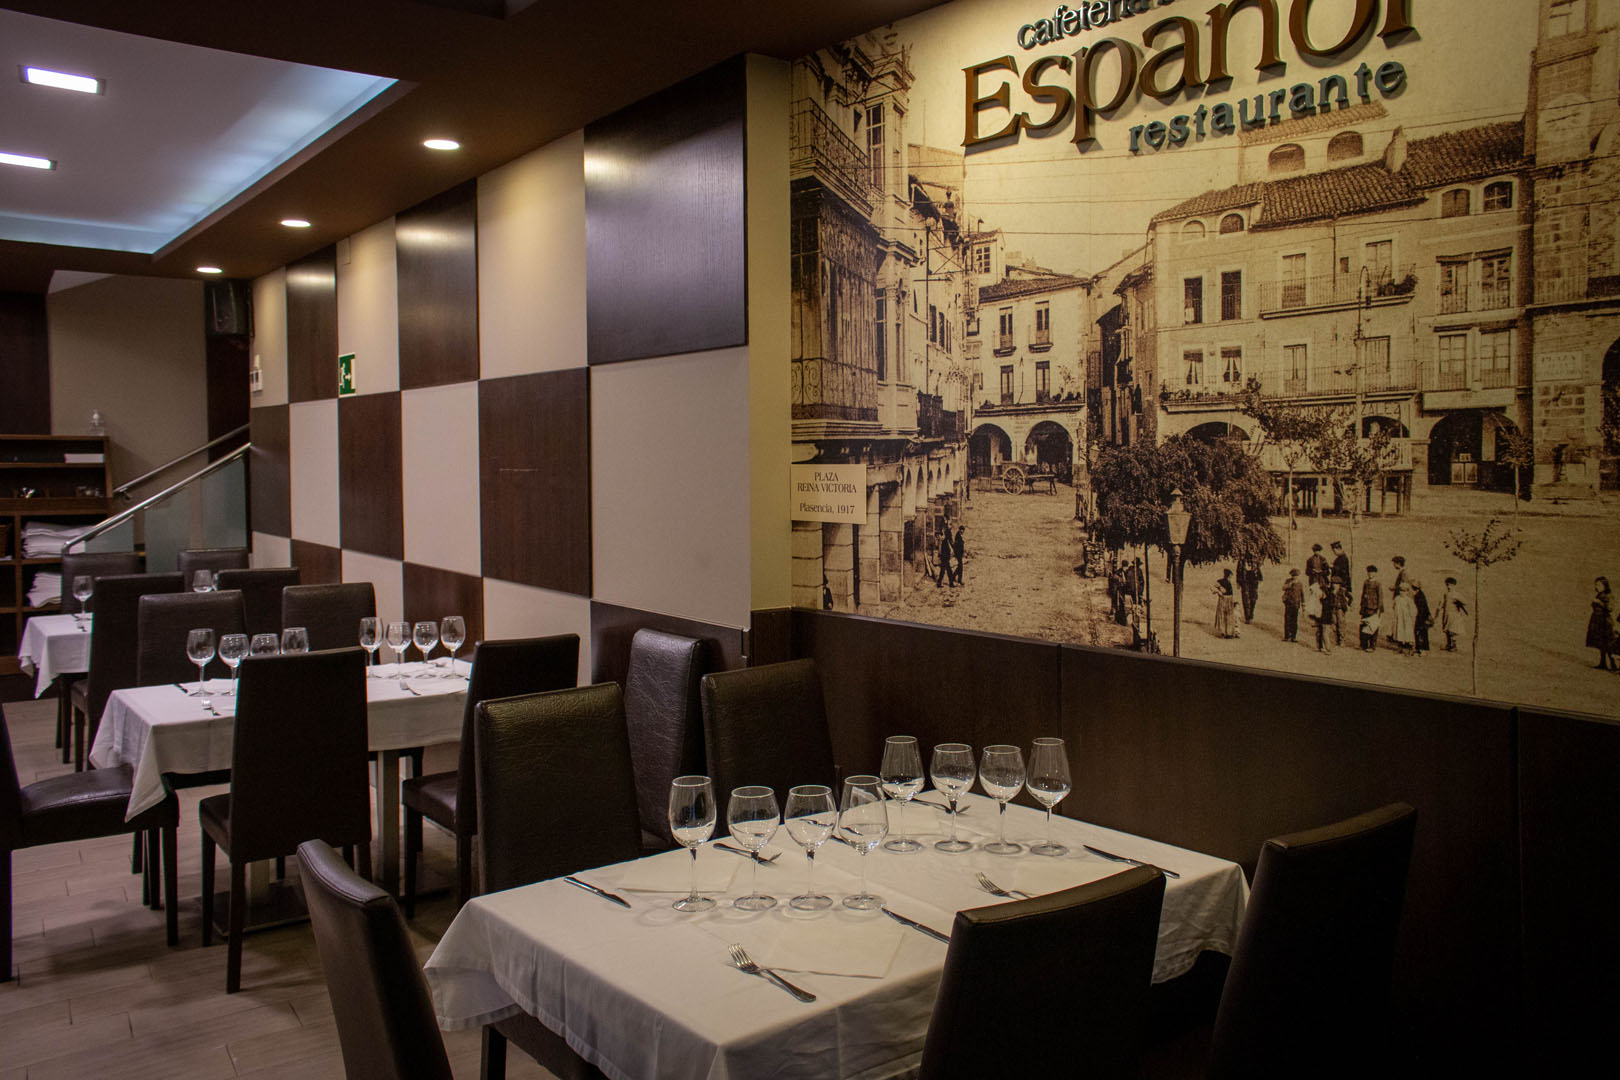 restaurante español plasencia